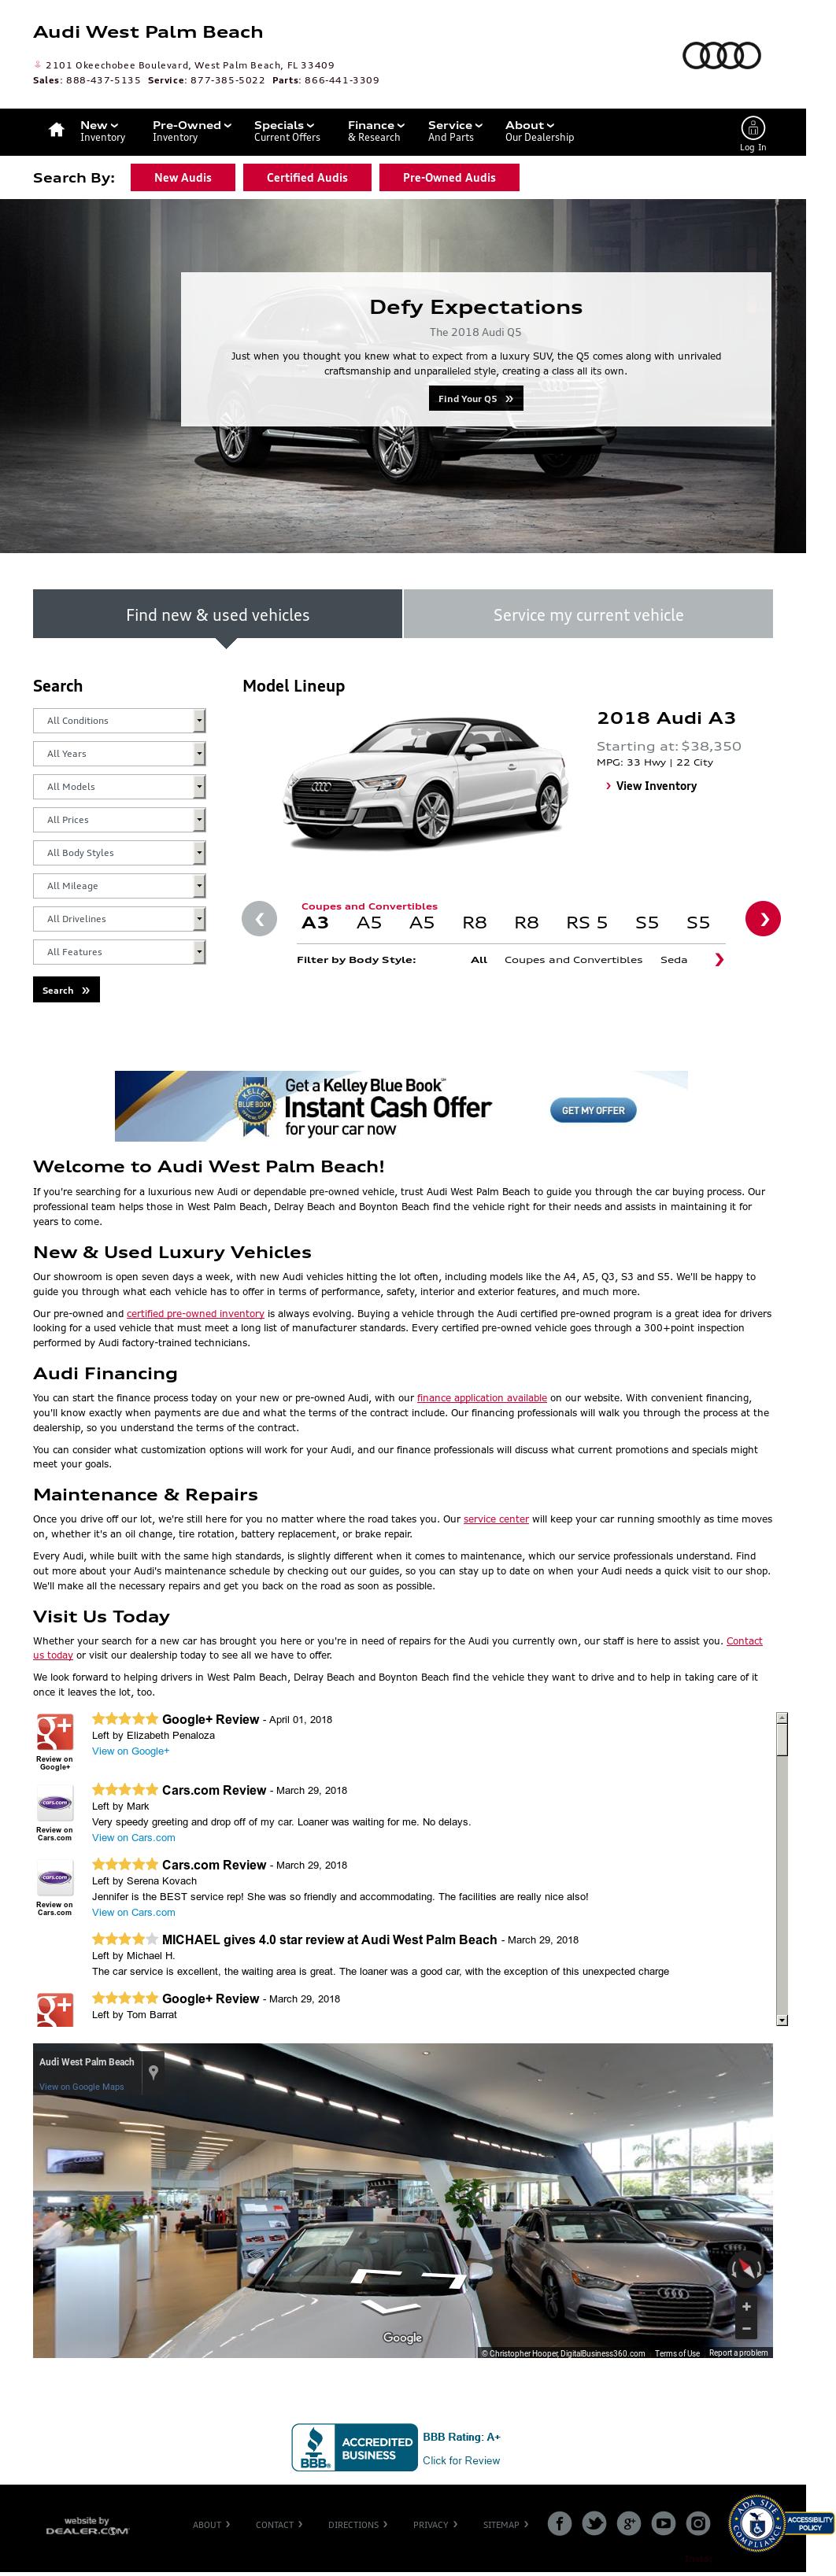 Braman Audi Competitors Revenue And Employees Owler Company Profile - Braman audi